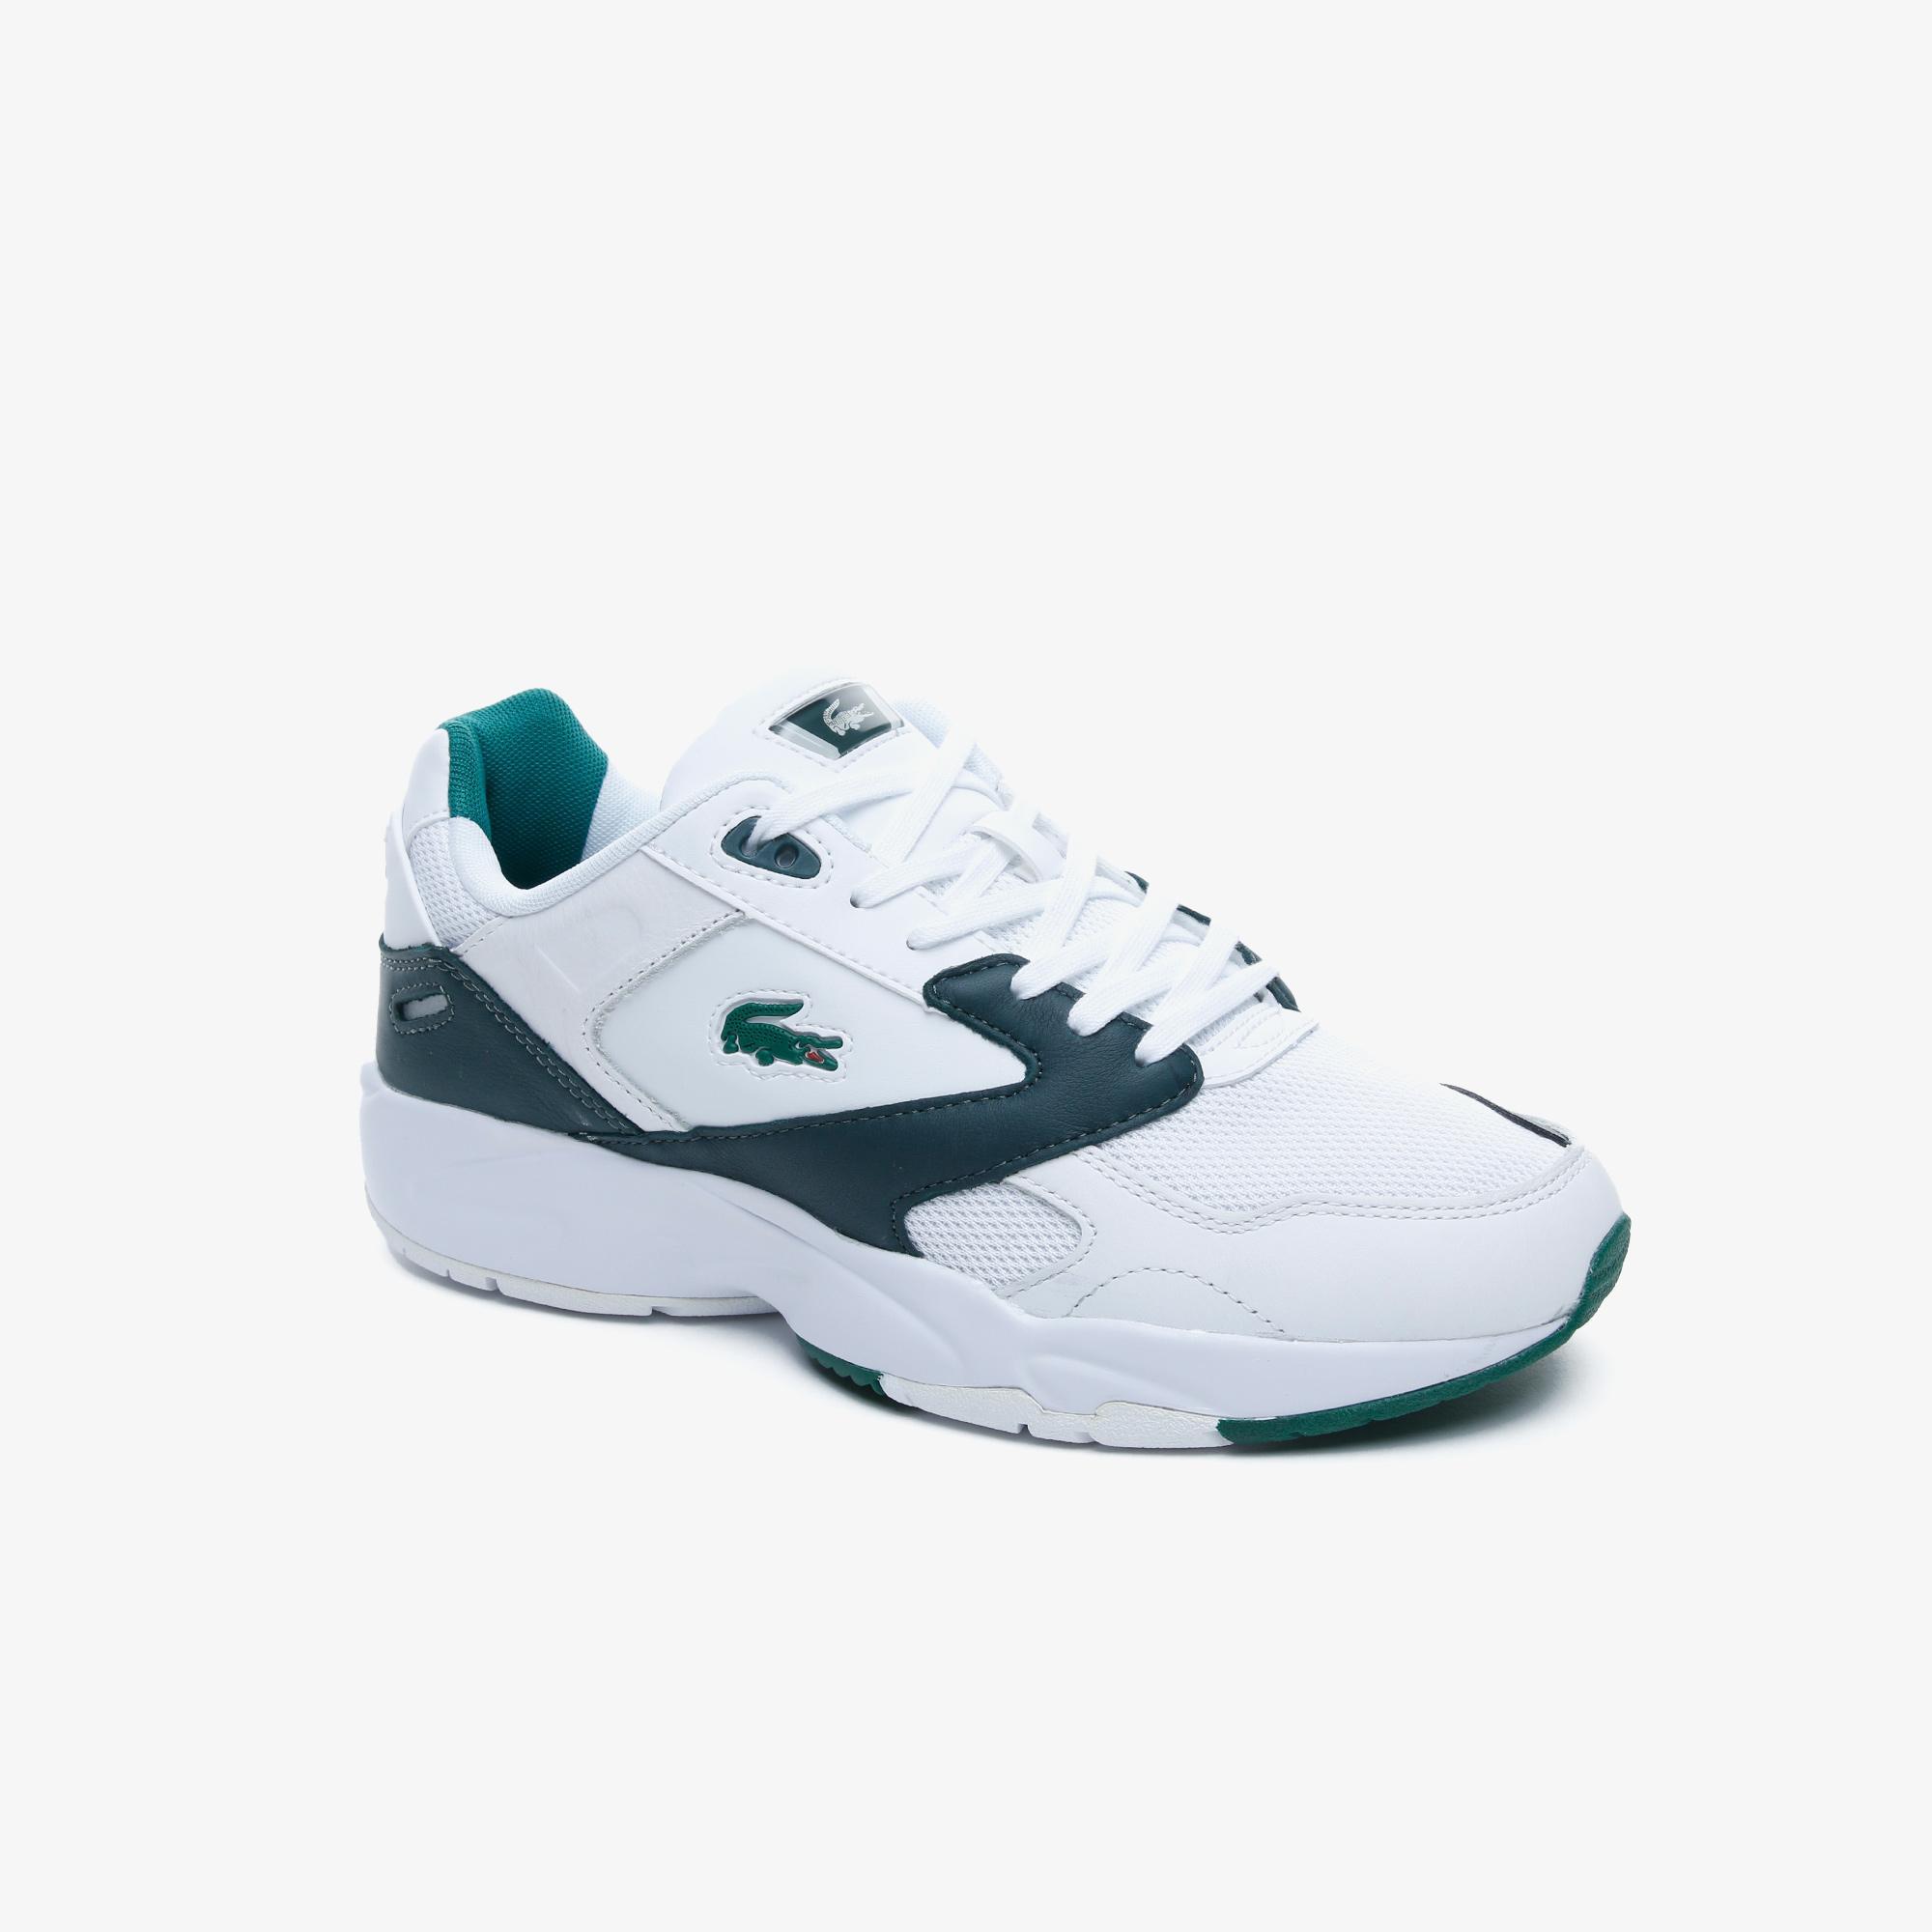 Lacoste Storm96 Lo 0220 1 Qsp Sma Erkek Beyaz - Koyu Yeşil Sneaker